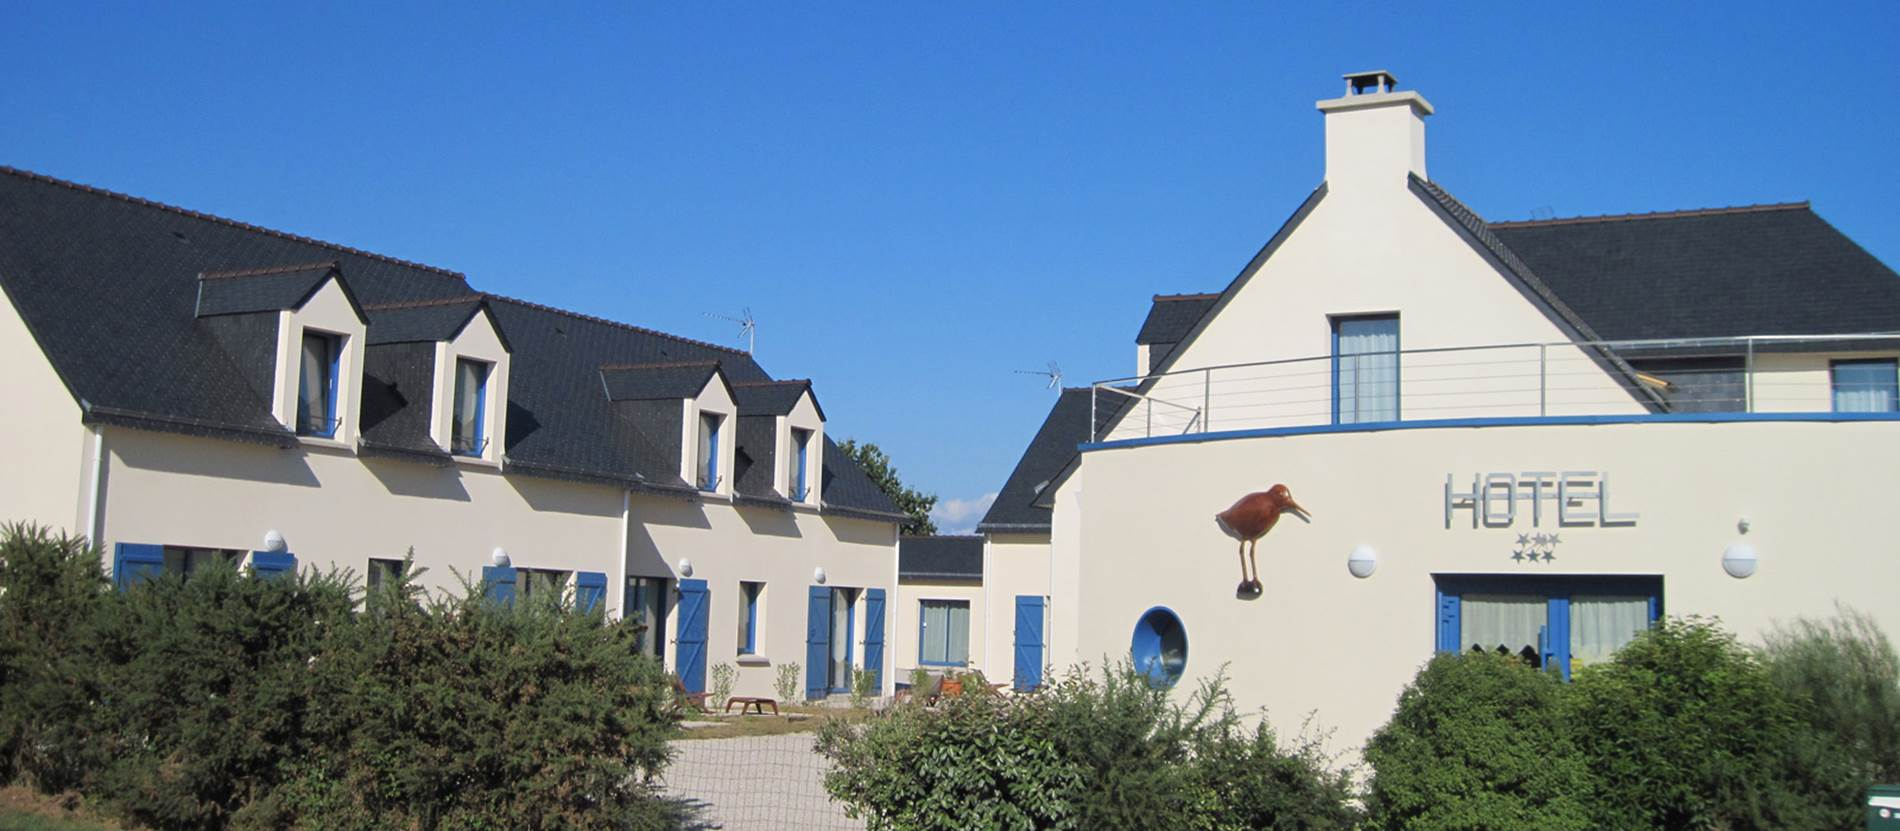 Hôtel-Chevalier-Gambette-Saint-Armel-Presqu'île-de-Rhuys-Golfe-du-Morbihan-Bretagne sud © Hôtel Chevalier Gambette